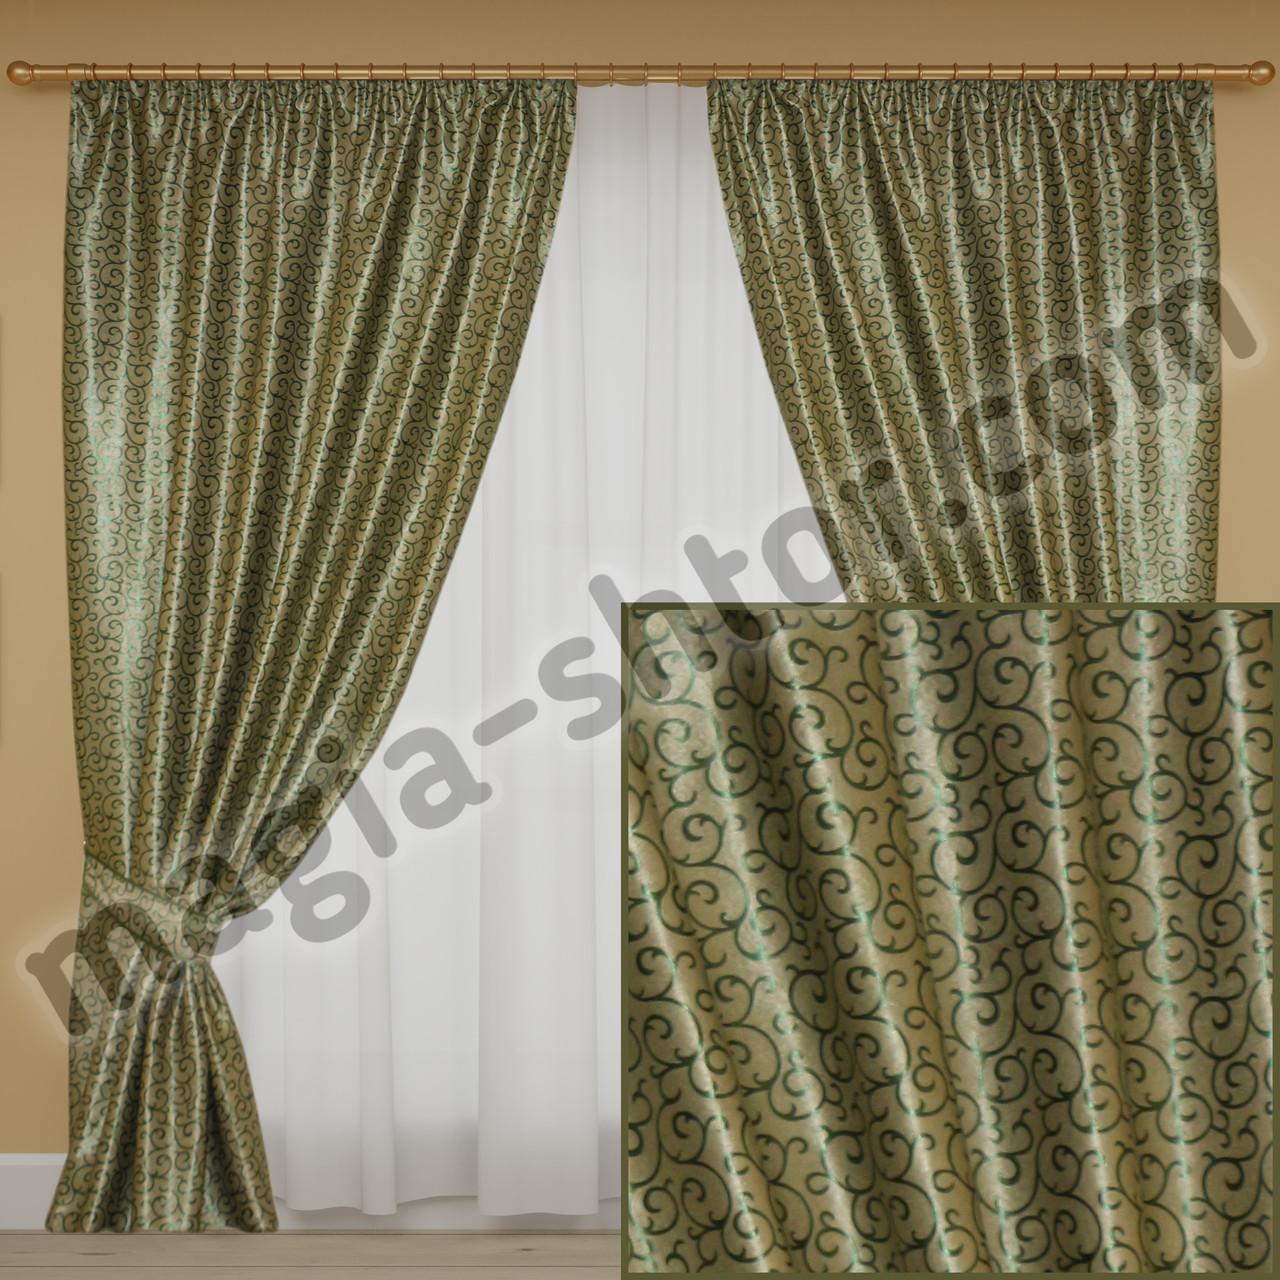 Светонепроницаемые шторы зеленые, коллекция блэкаут